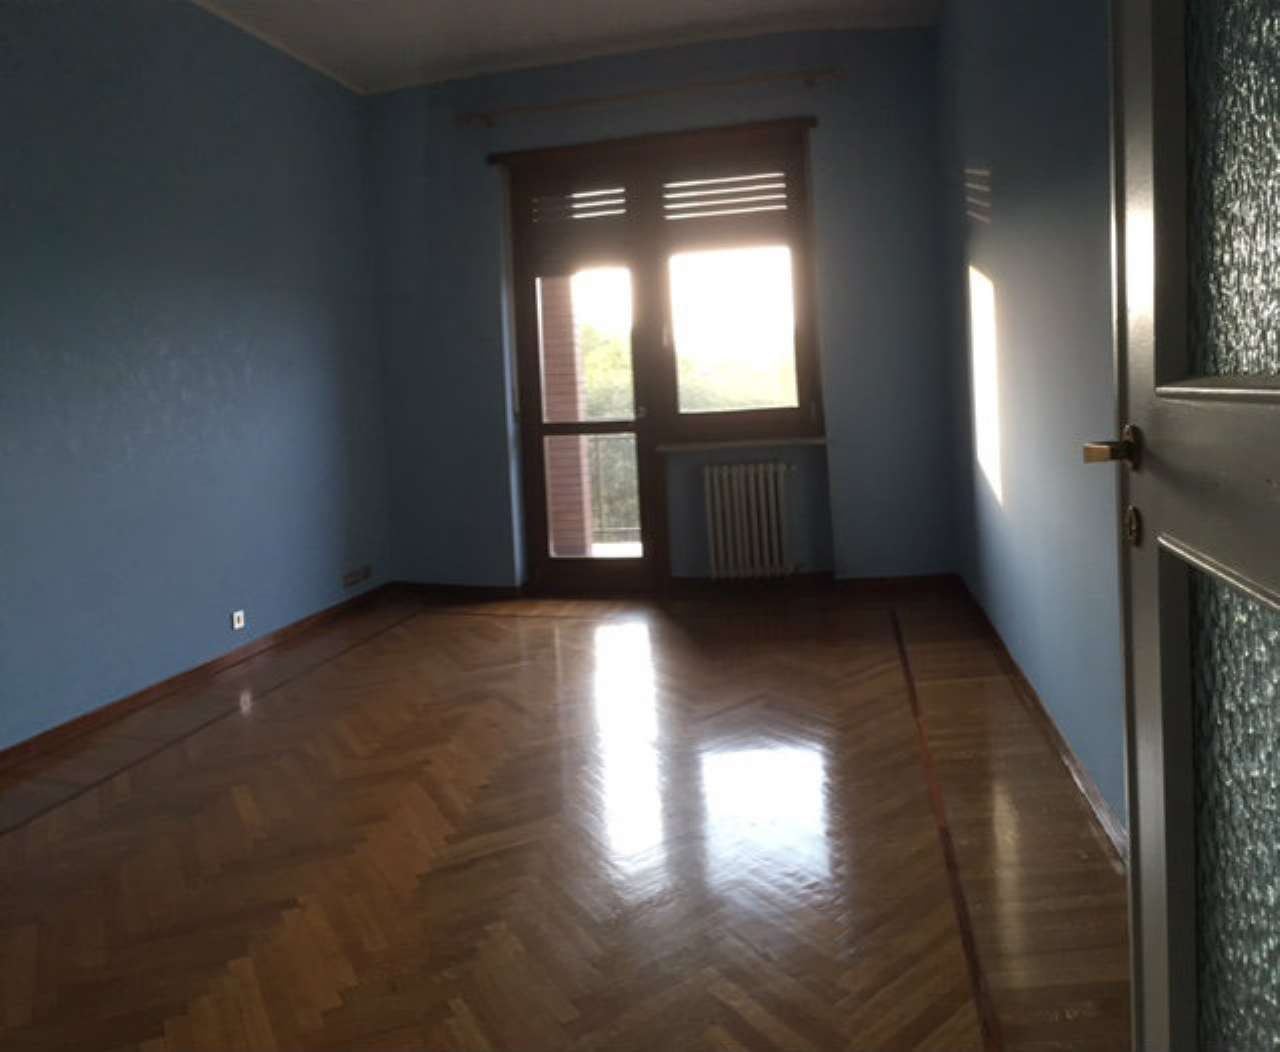 Foto 4 di Appartamento via Arnaldo da Brescia, Torino (zona Lingotto)